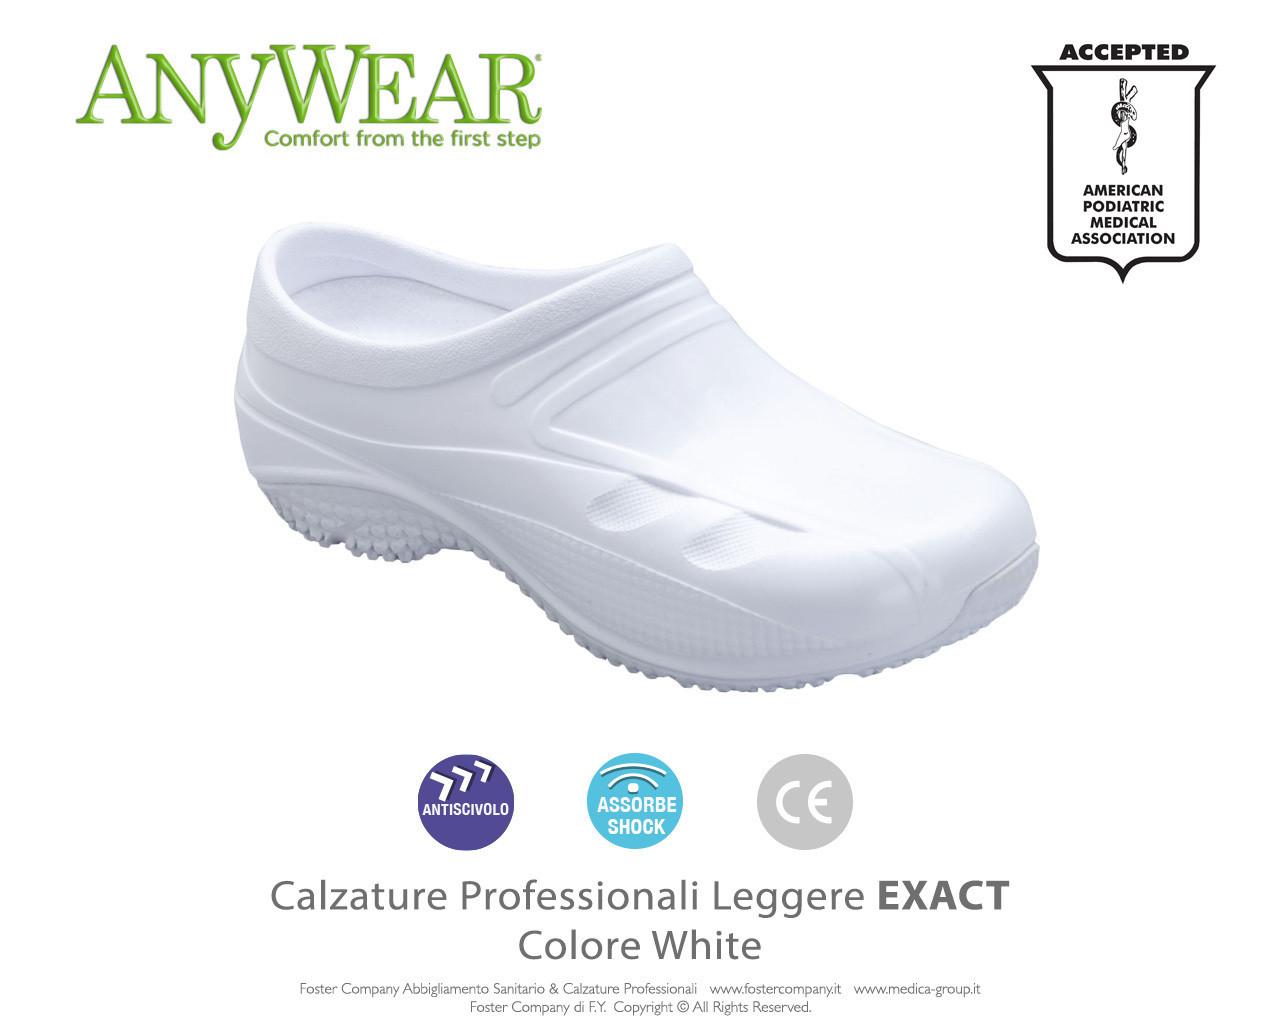 Calzature Professionali Anywear EXACT Colore White